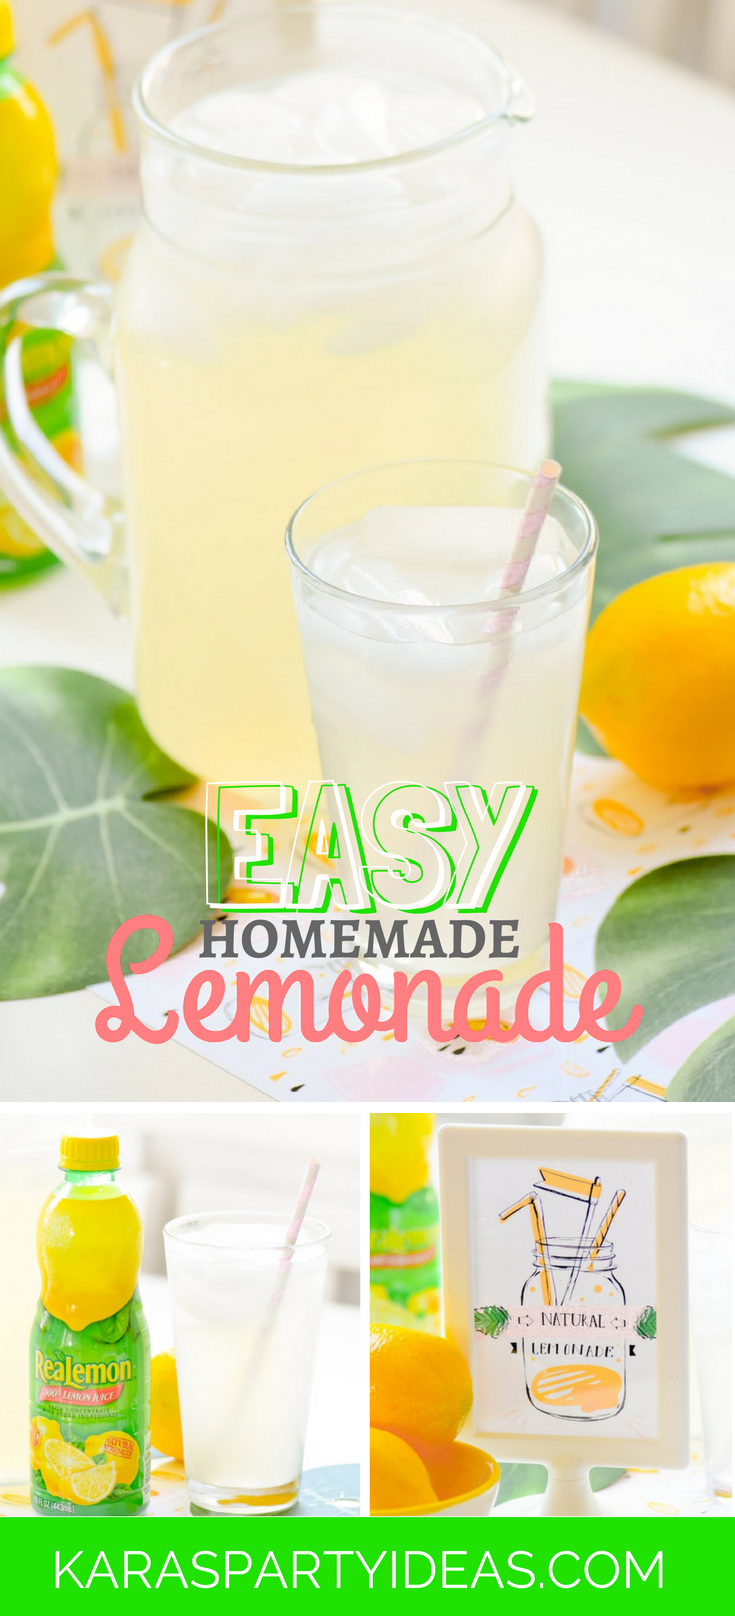 Easy Homemade Lemonade using RealLemon Lemon Juice by Kara's Party Ideas - KarasPartyIdeas.com